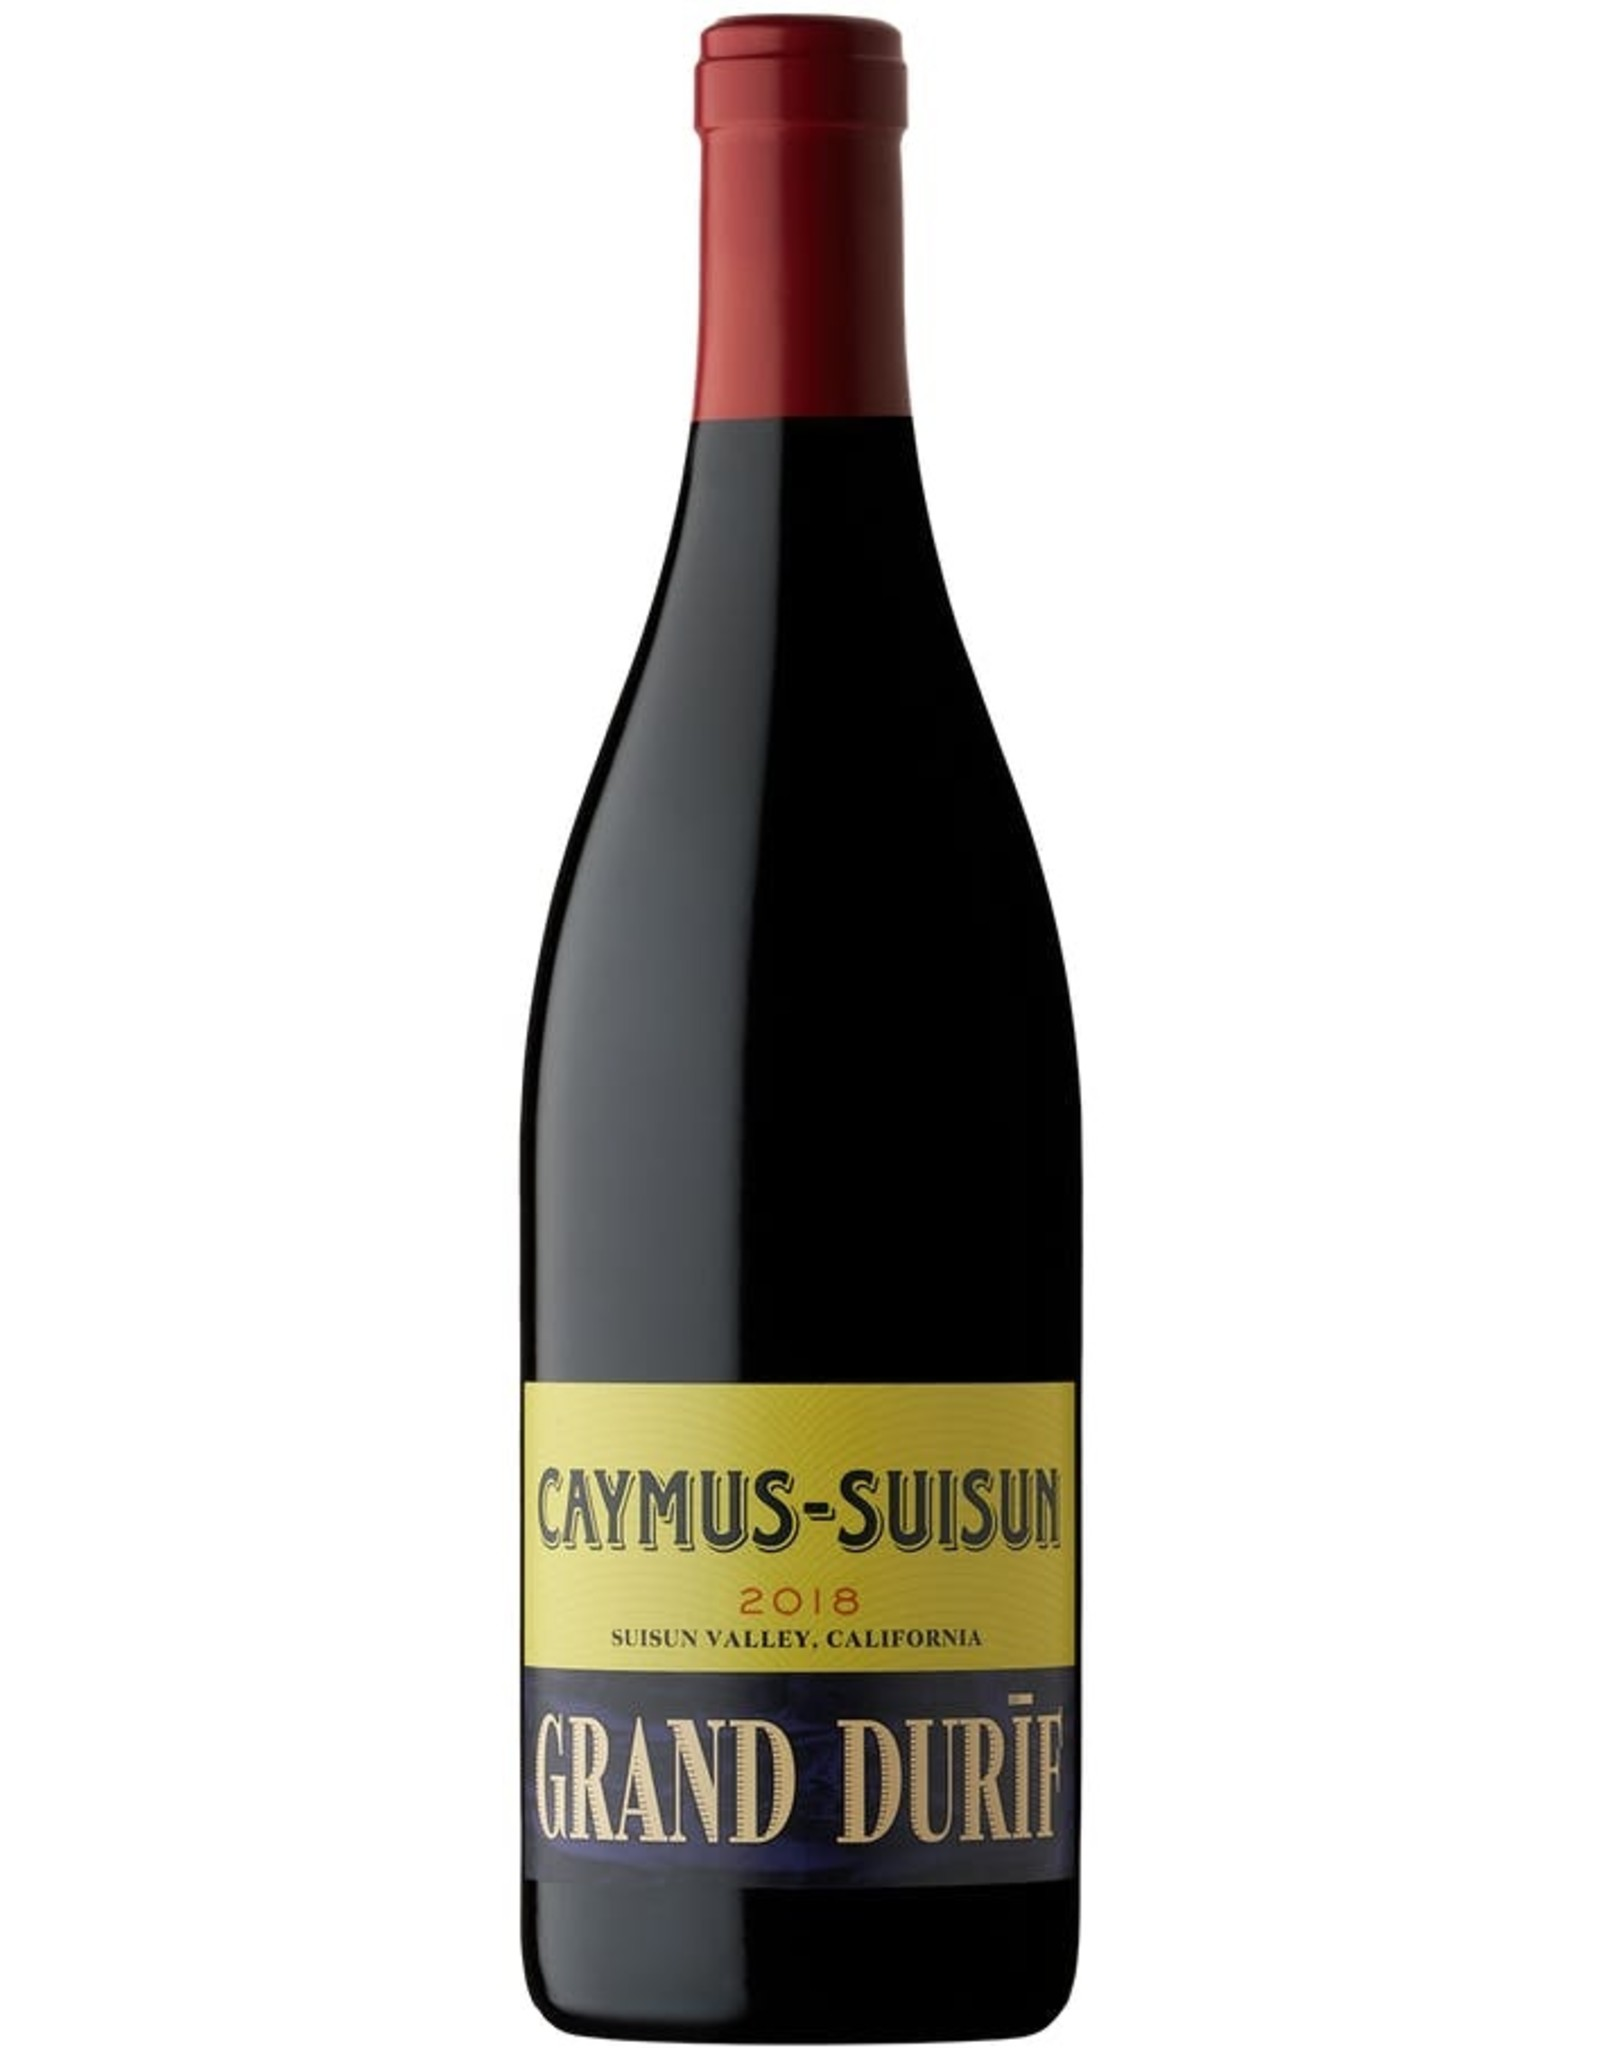 Caymus-Suisun Grand Durif 3L 2018